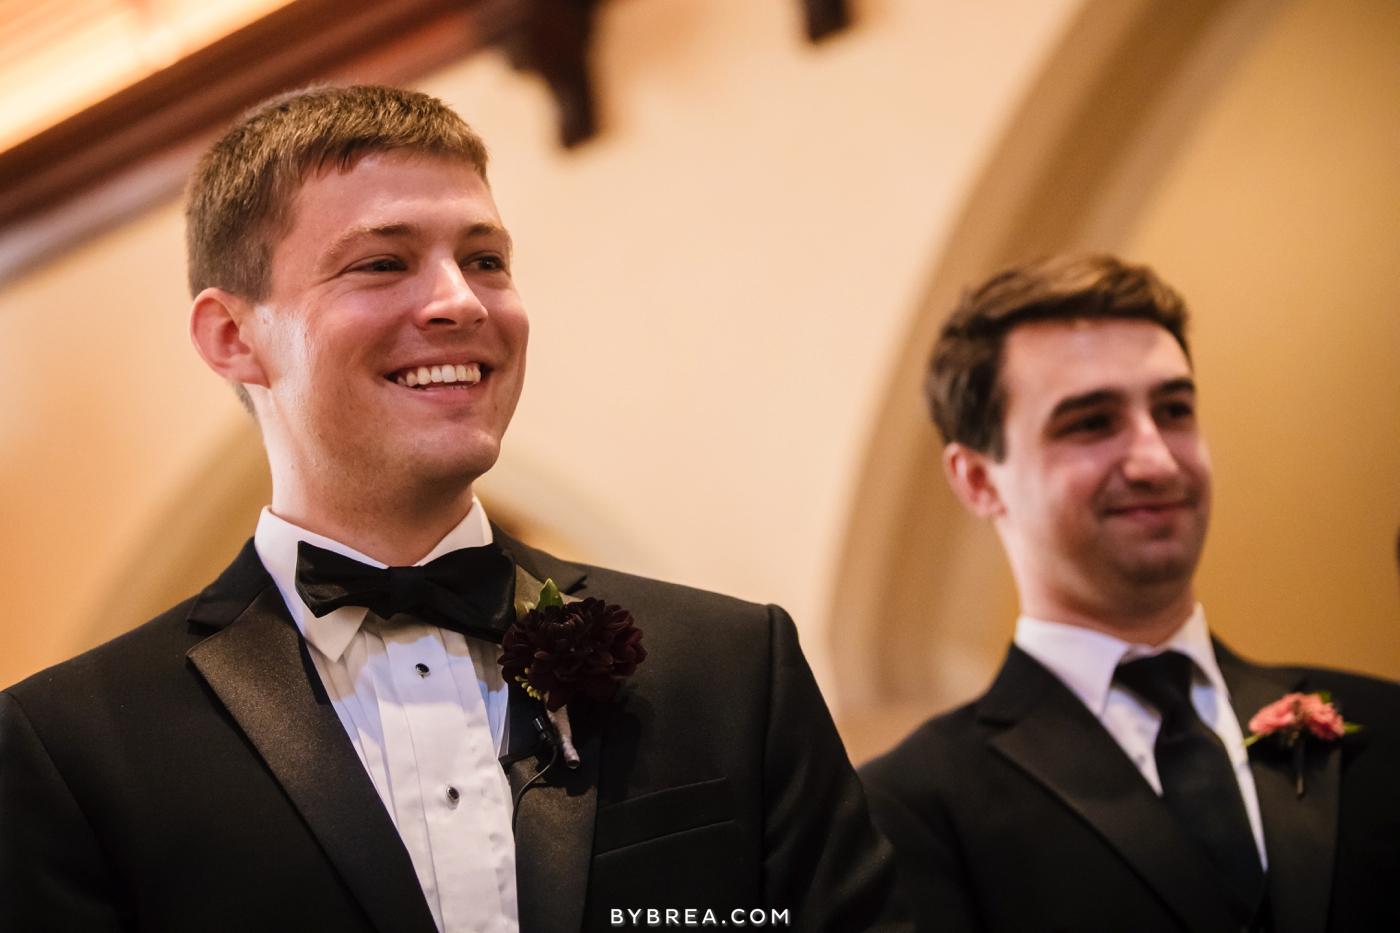 Dahlgren Chapel groom smiles as bride walks down aisle